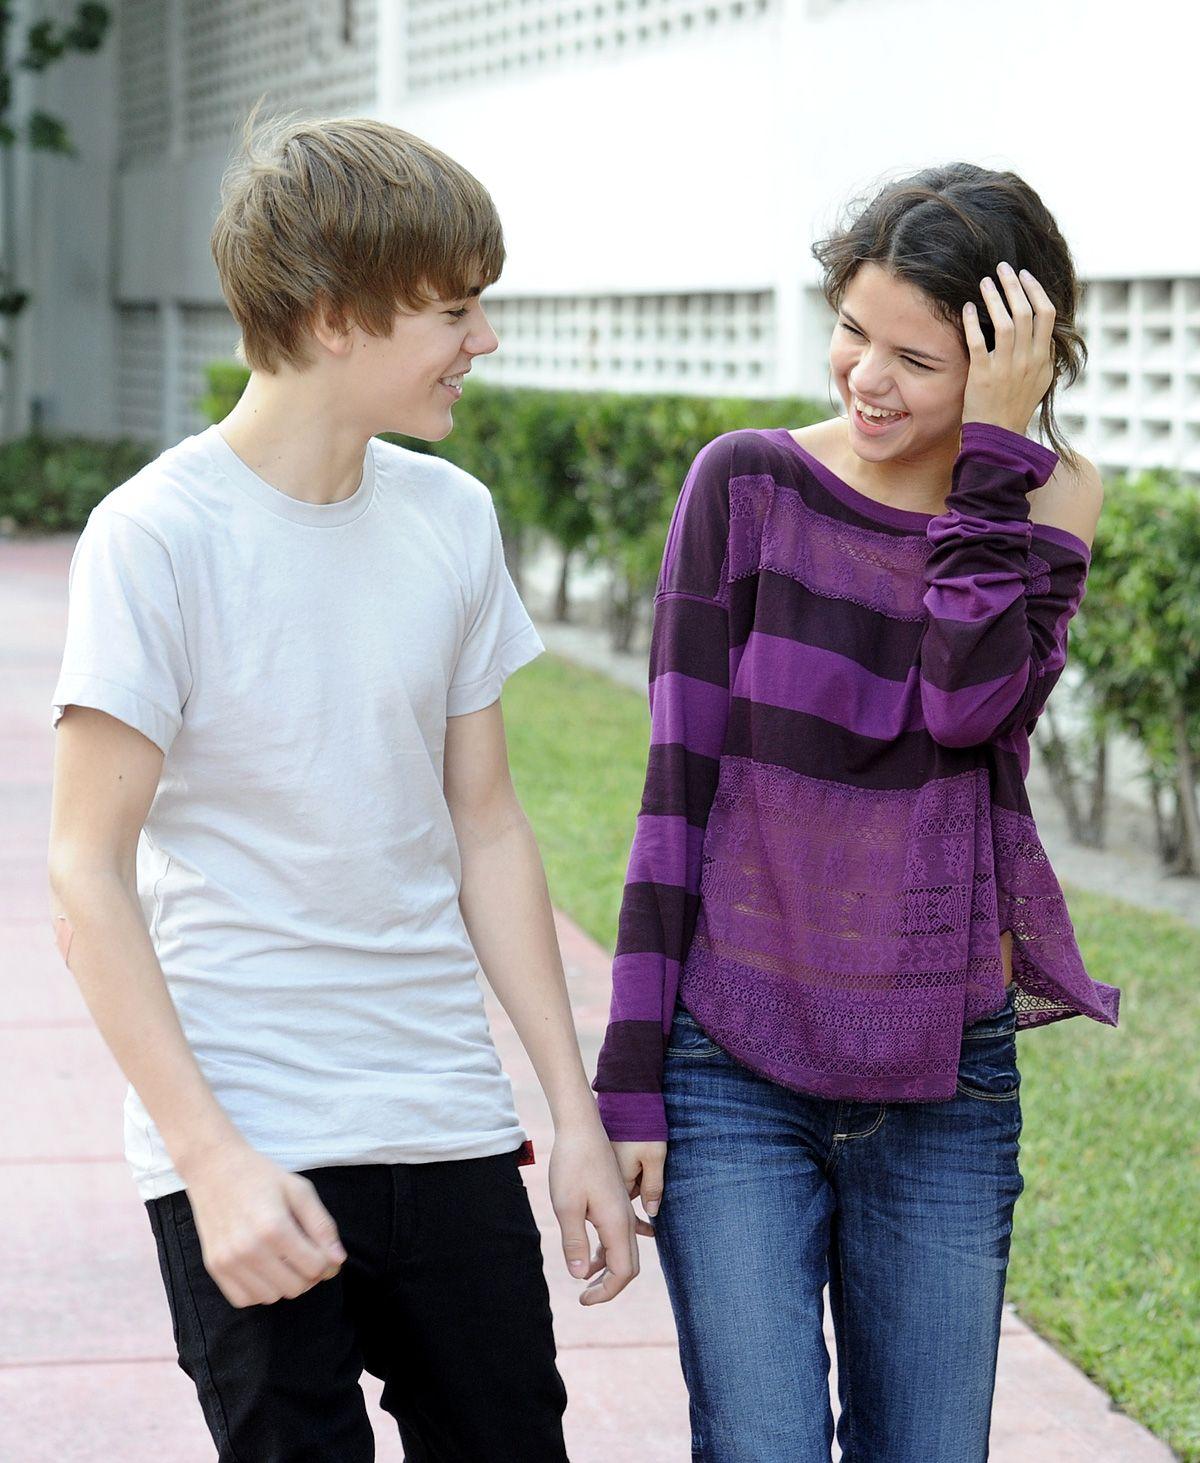 50 Selena Gomez Wallpapers Hd Download Justin Bieber And Selena Selena Gomez Wallpaper Justin Bieber Wallpaper